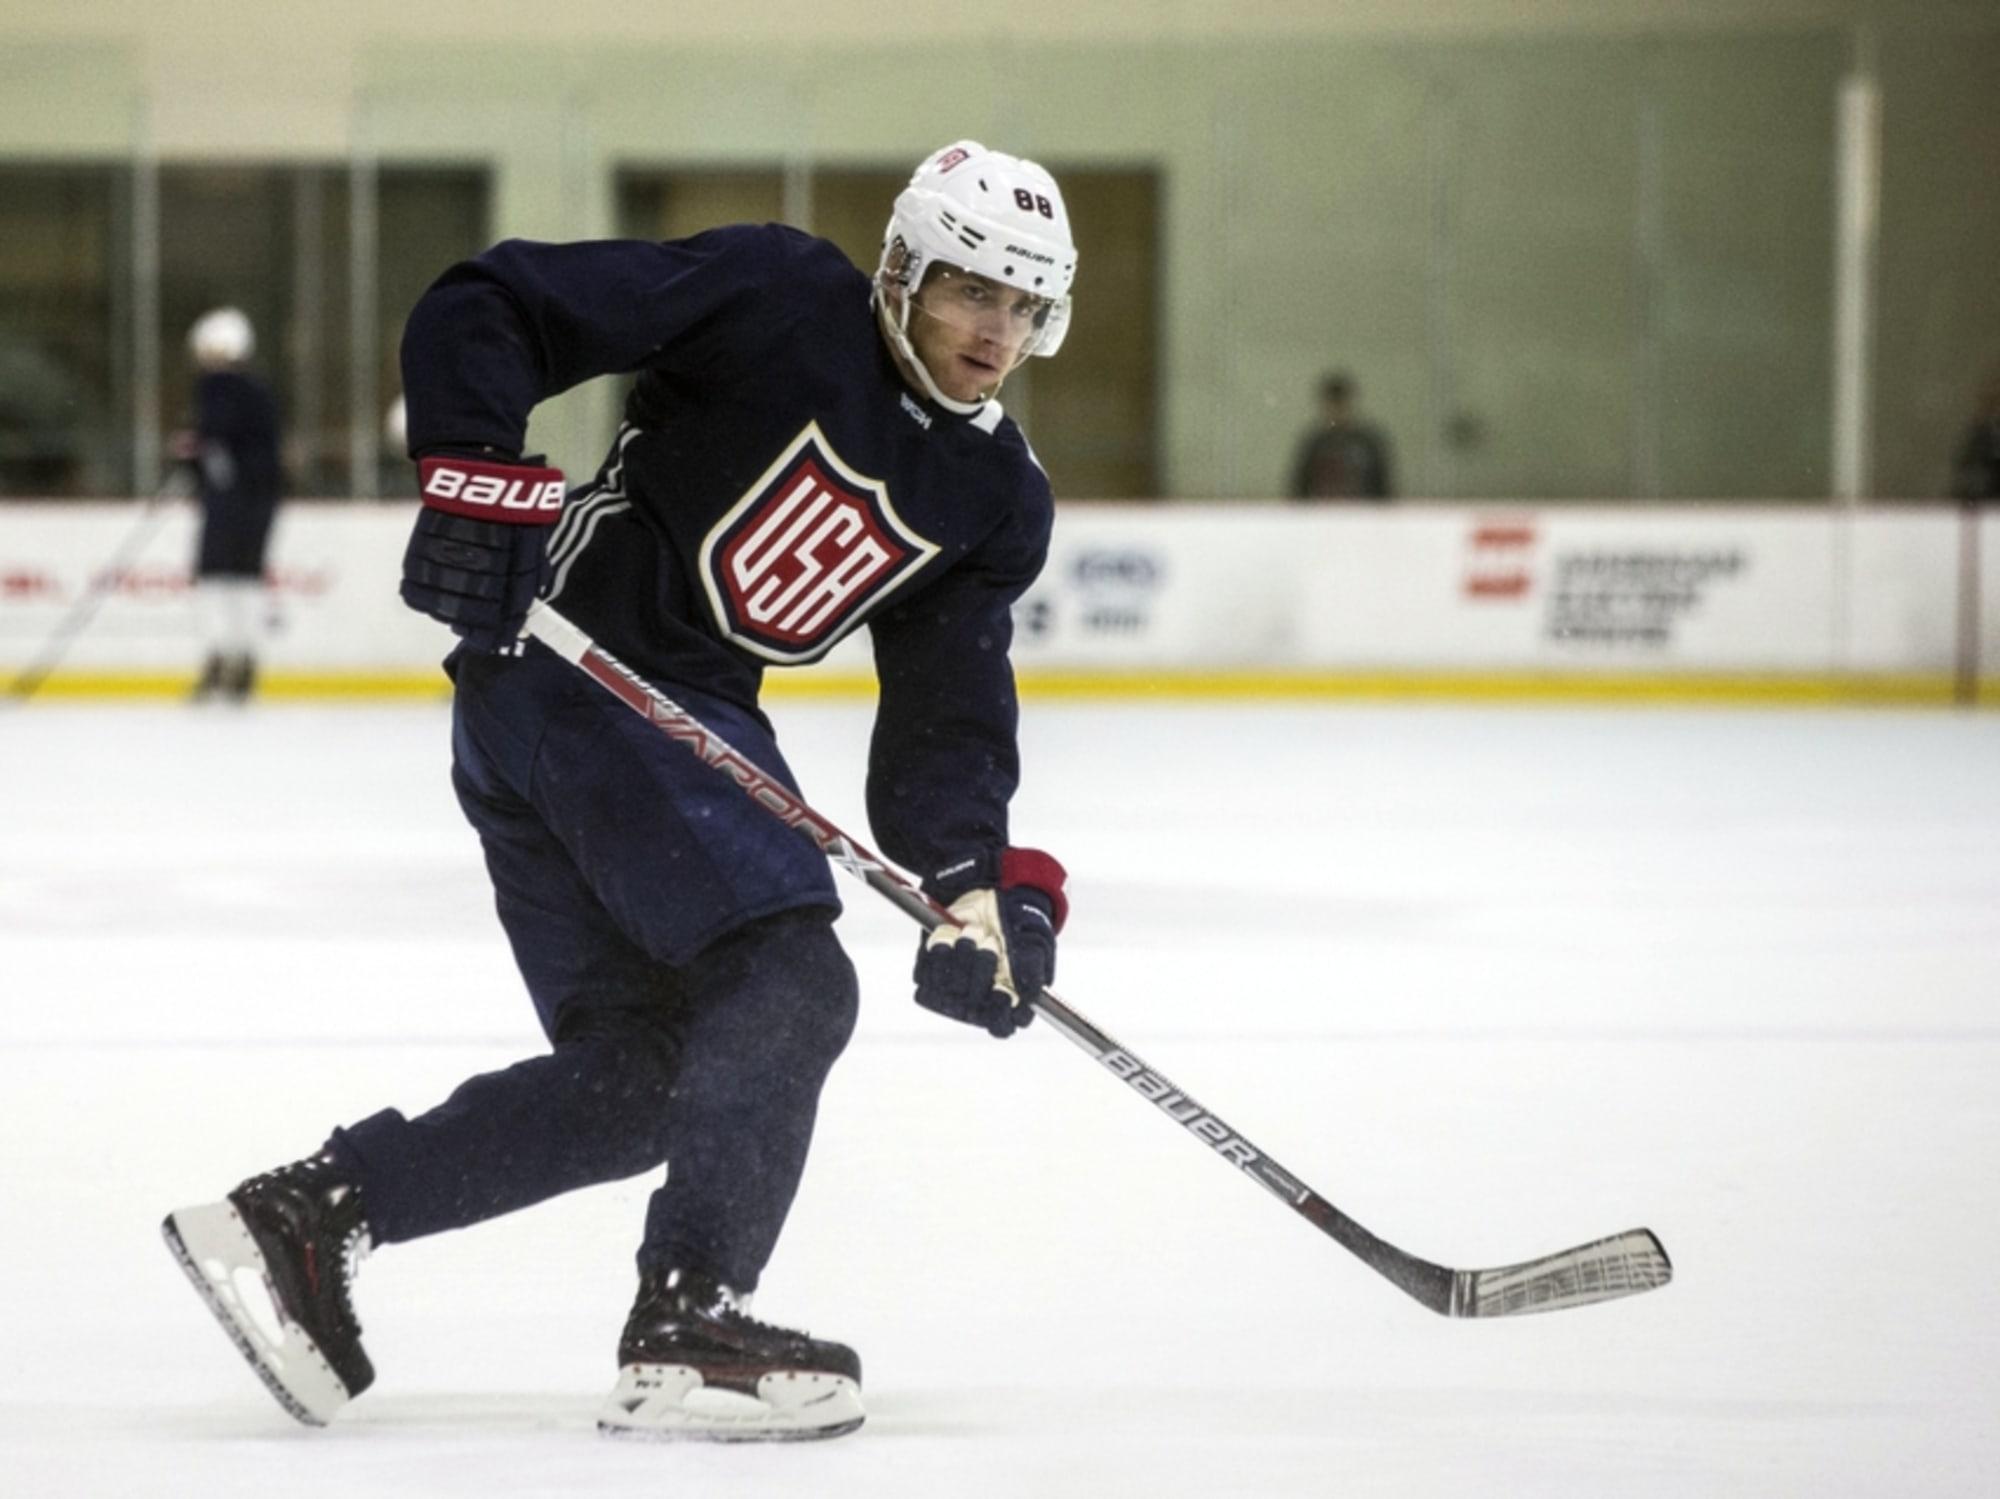 World Cup Of Hockey Blackhawks Patrick Kane Facing Pressure